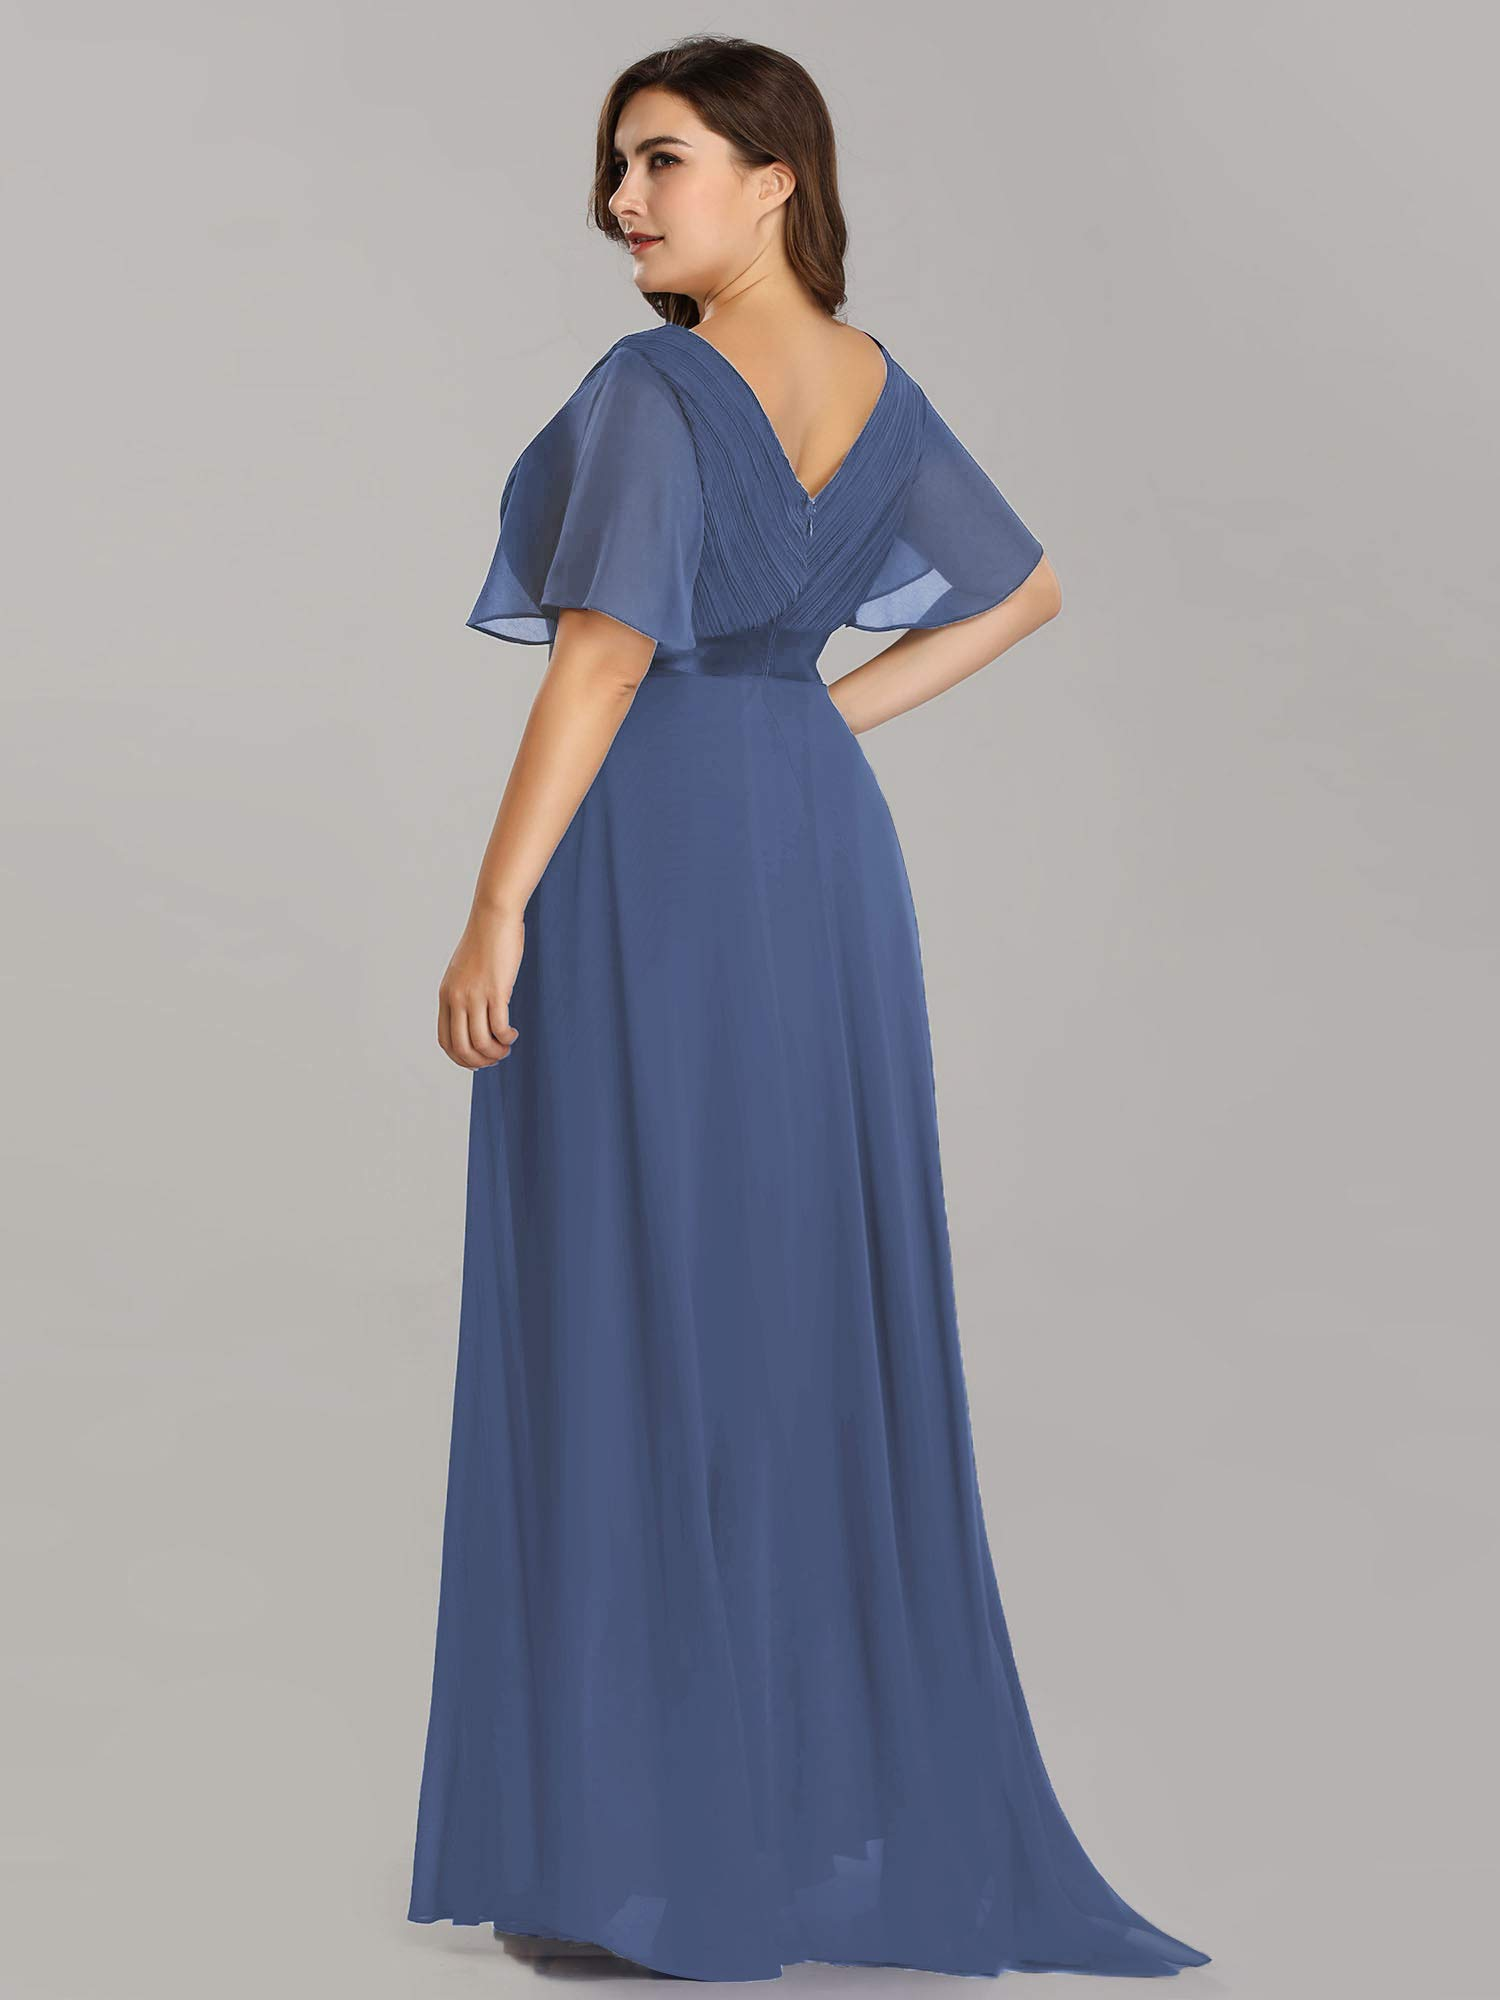 Alisapan Womens A-Line Bridesmaid Dress Plus Size Formal Evening Dresses  Dusty Blue US20